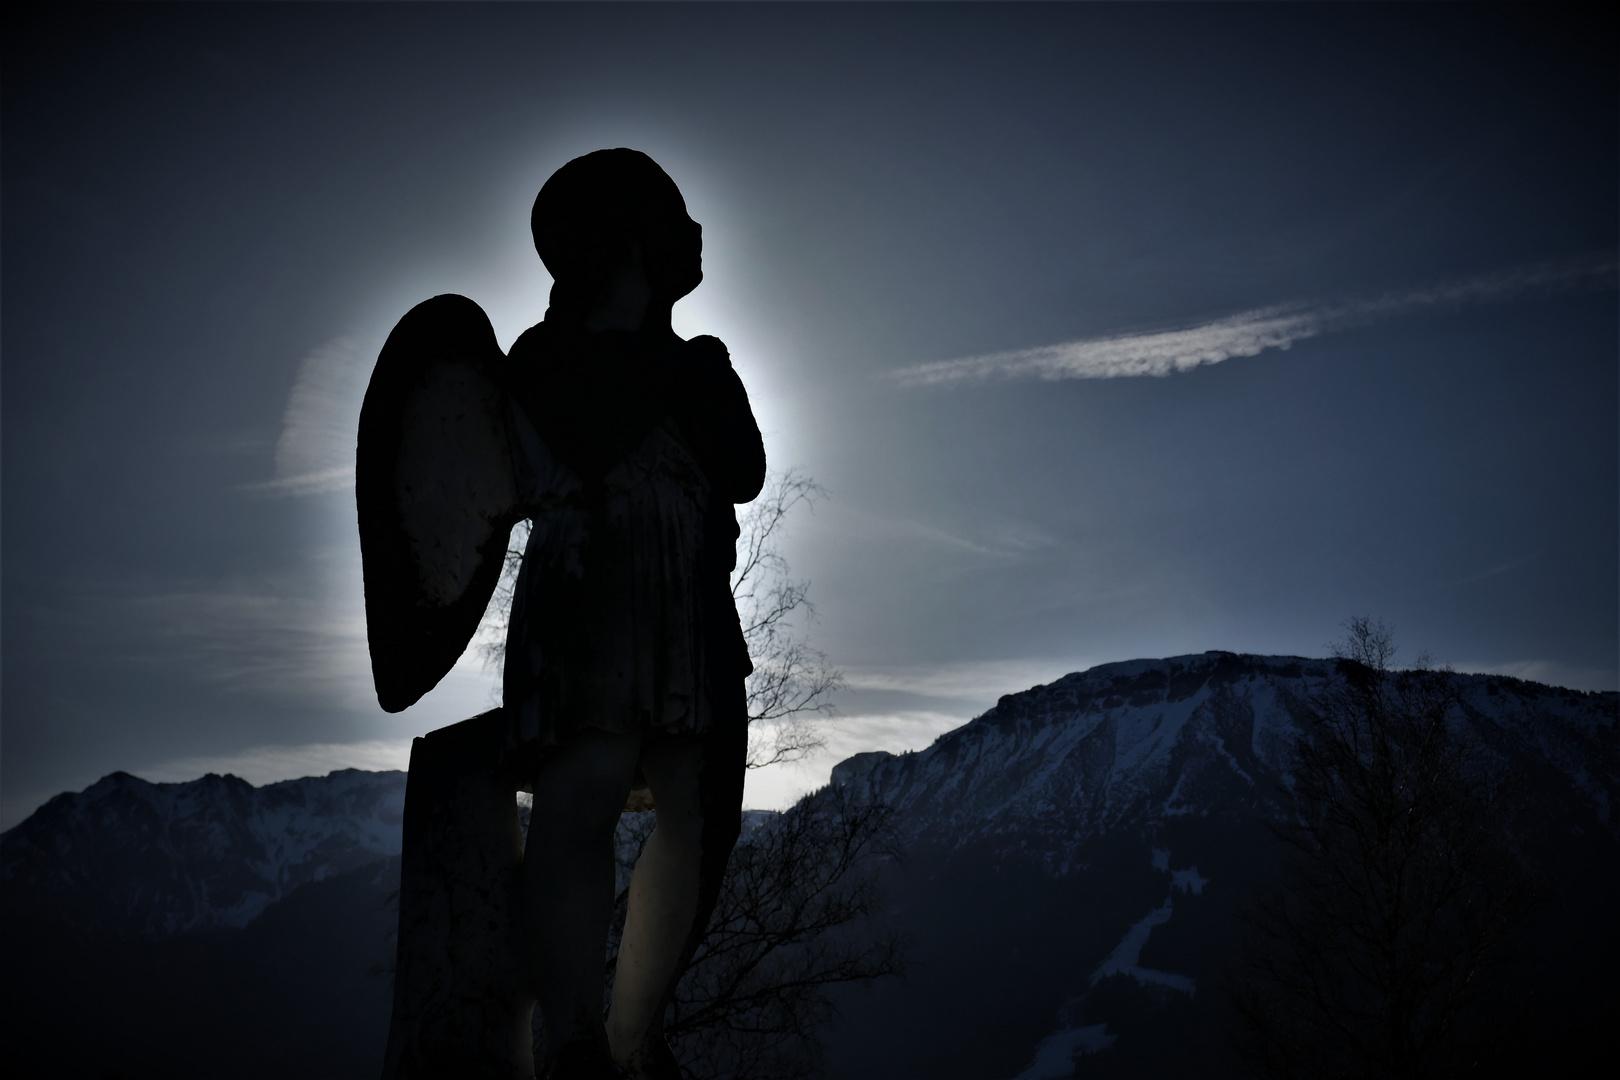 Angel of Gloom